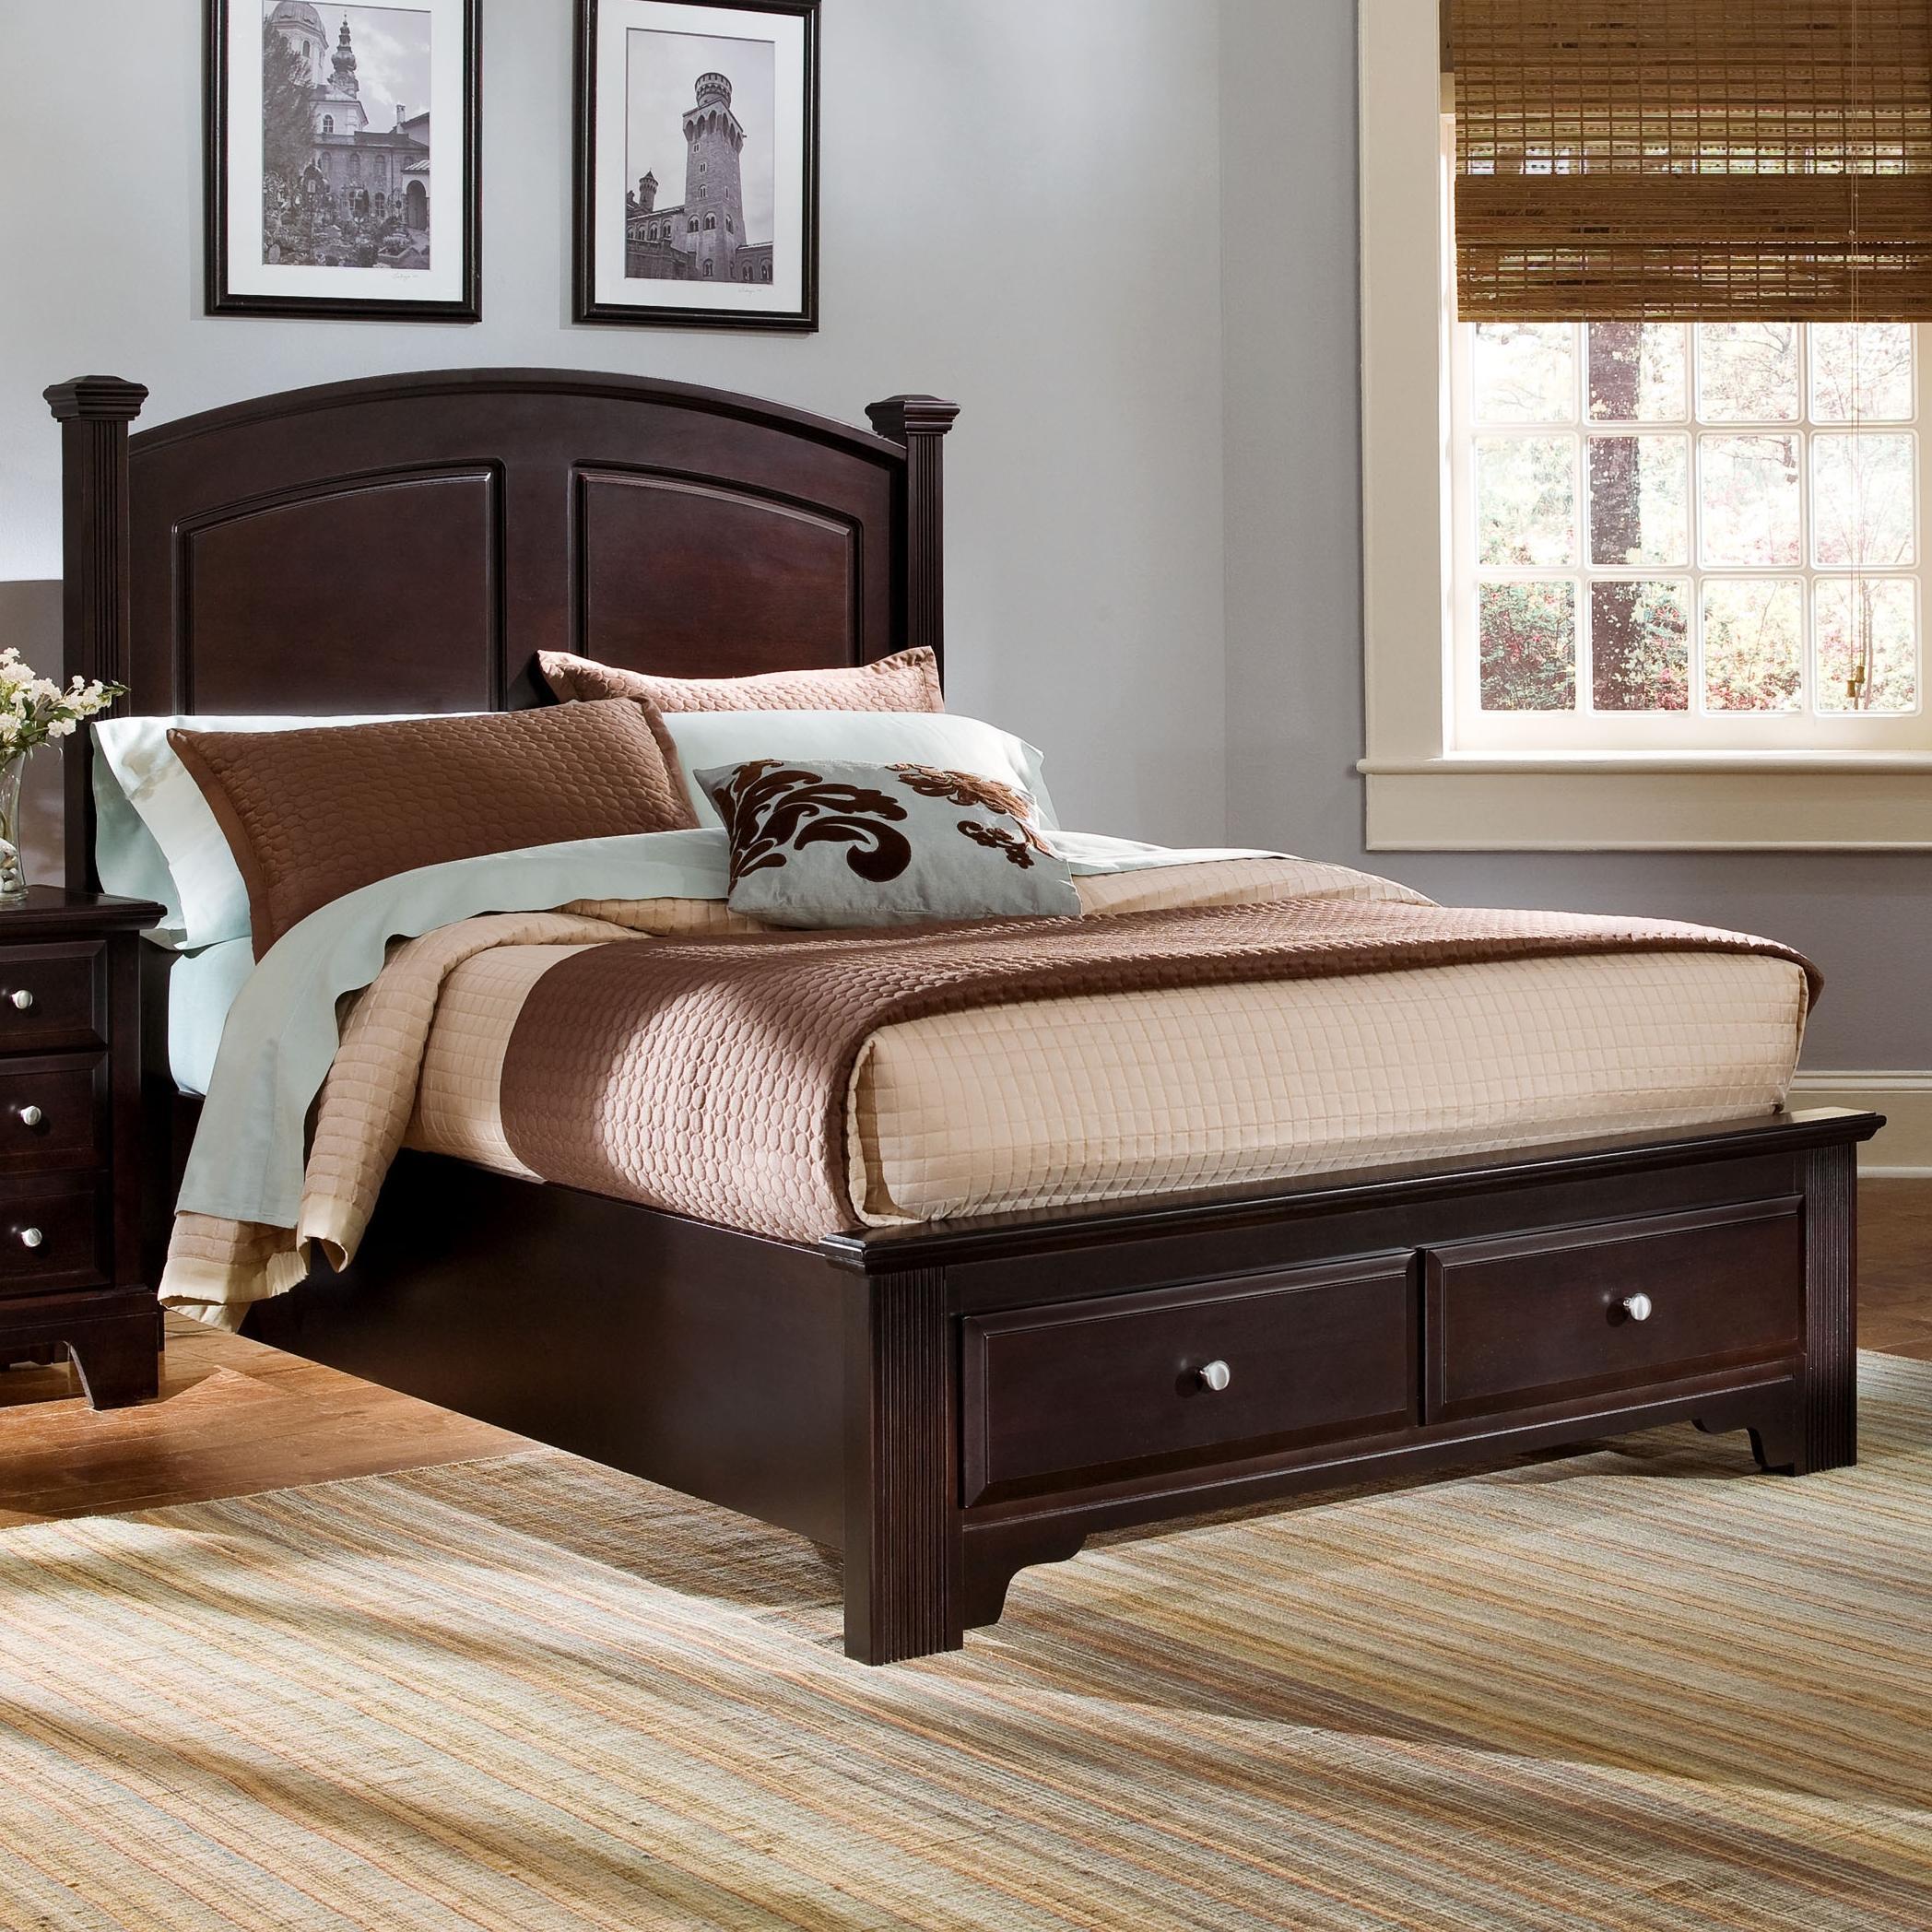 Vaughan Bassett Hamilton/Franklin Full Panel Storage Bed